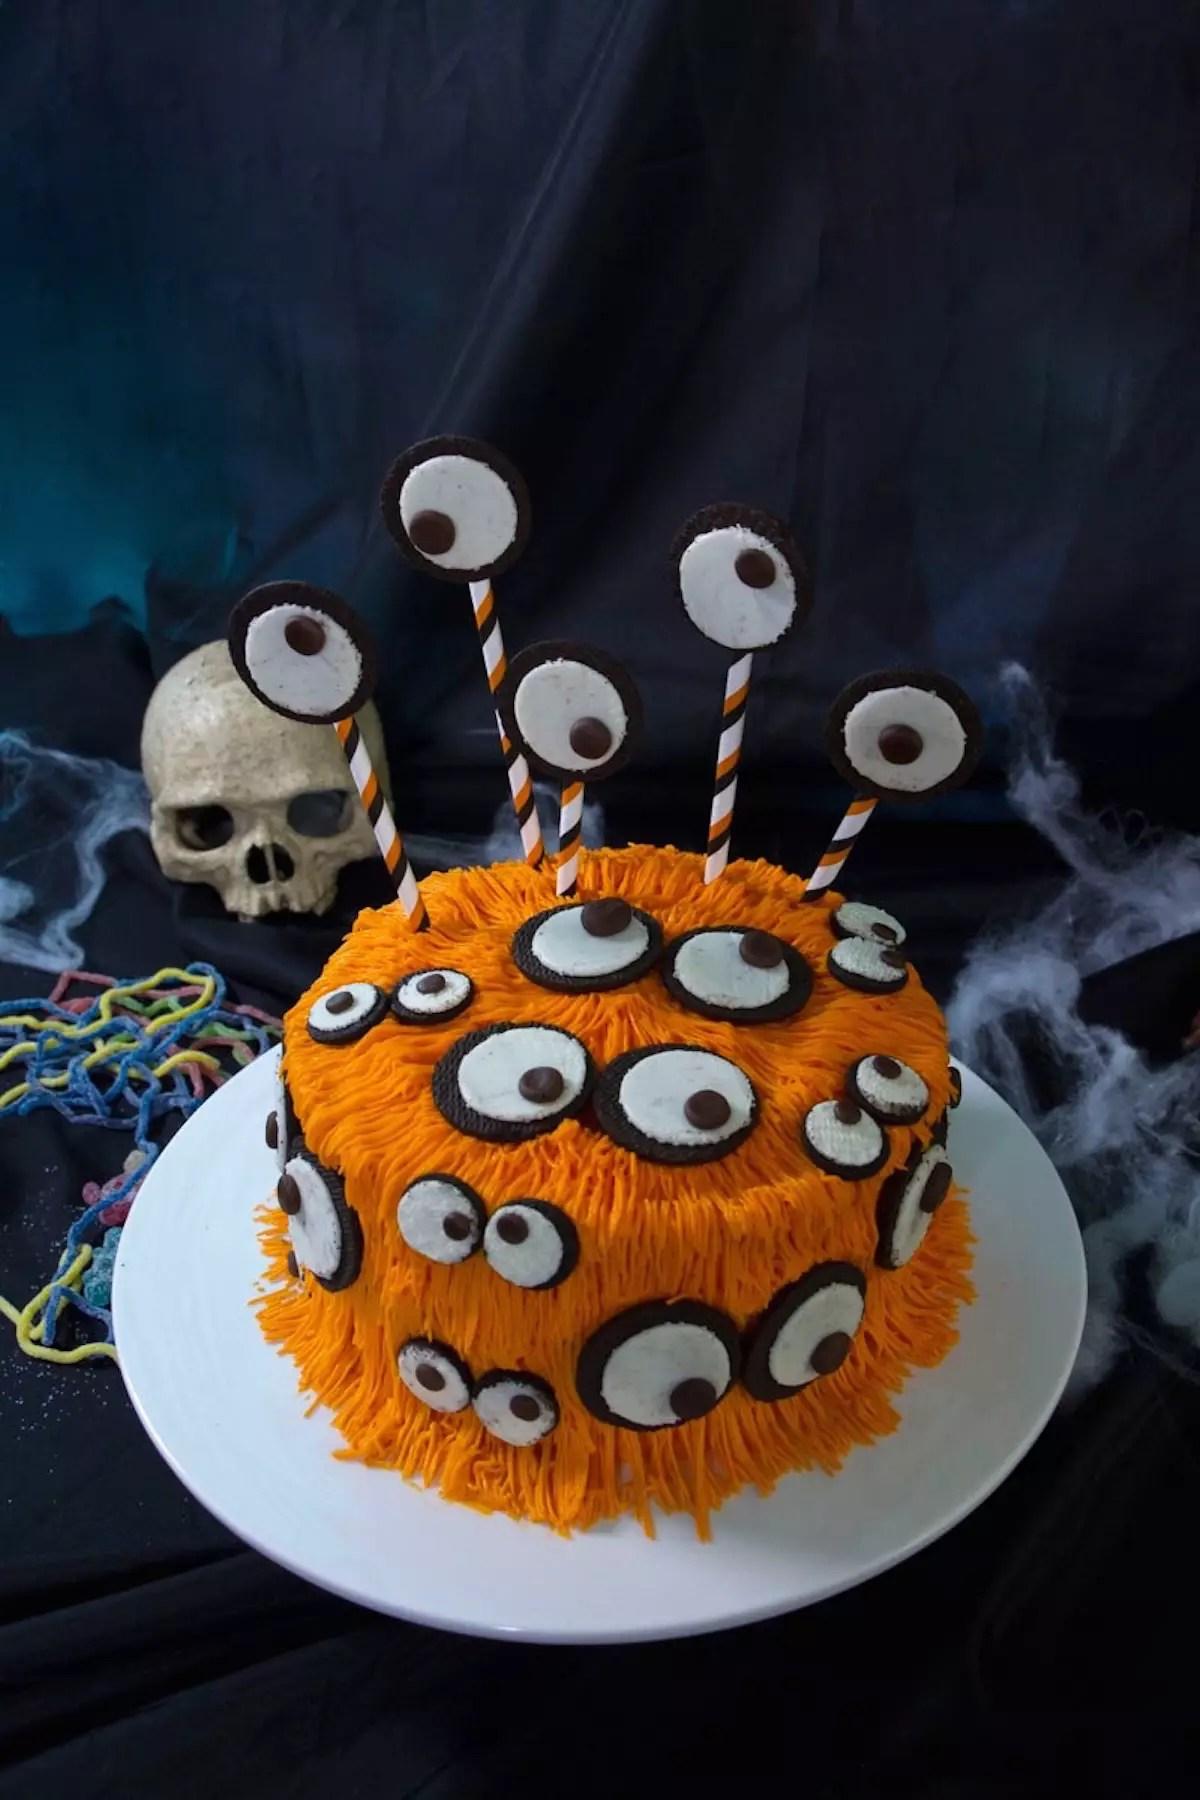 Halloween monster cake with Oreos eyes